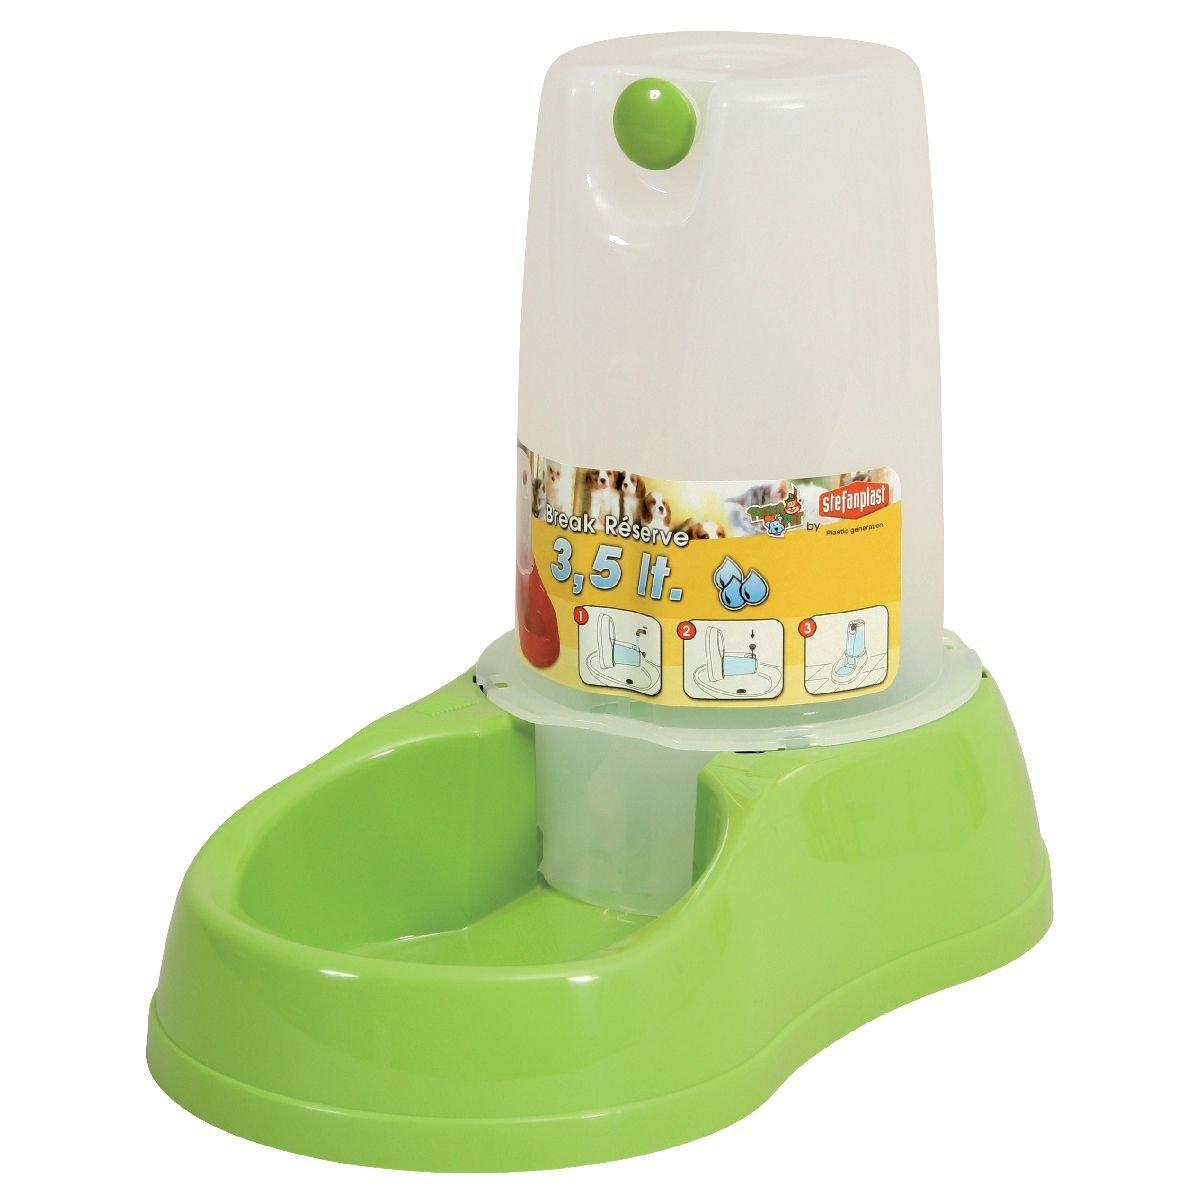 Stefanplast 4-04157 Tolva Agua, 1.5 l, Color Verde: Amazon.es: Productos para mascotas